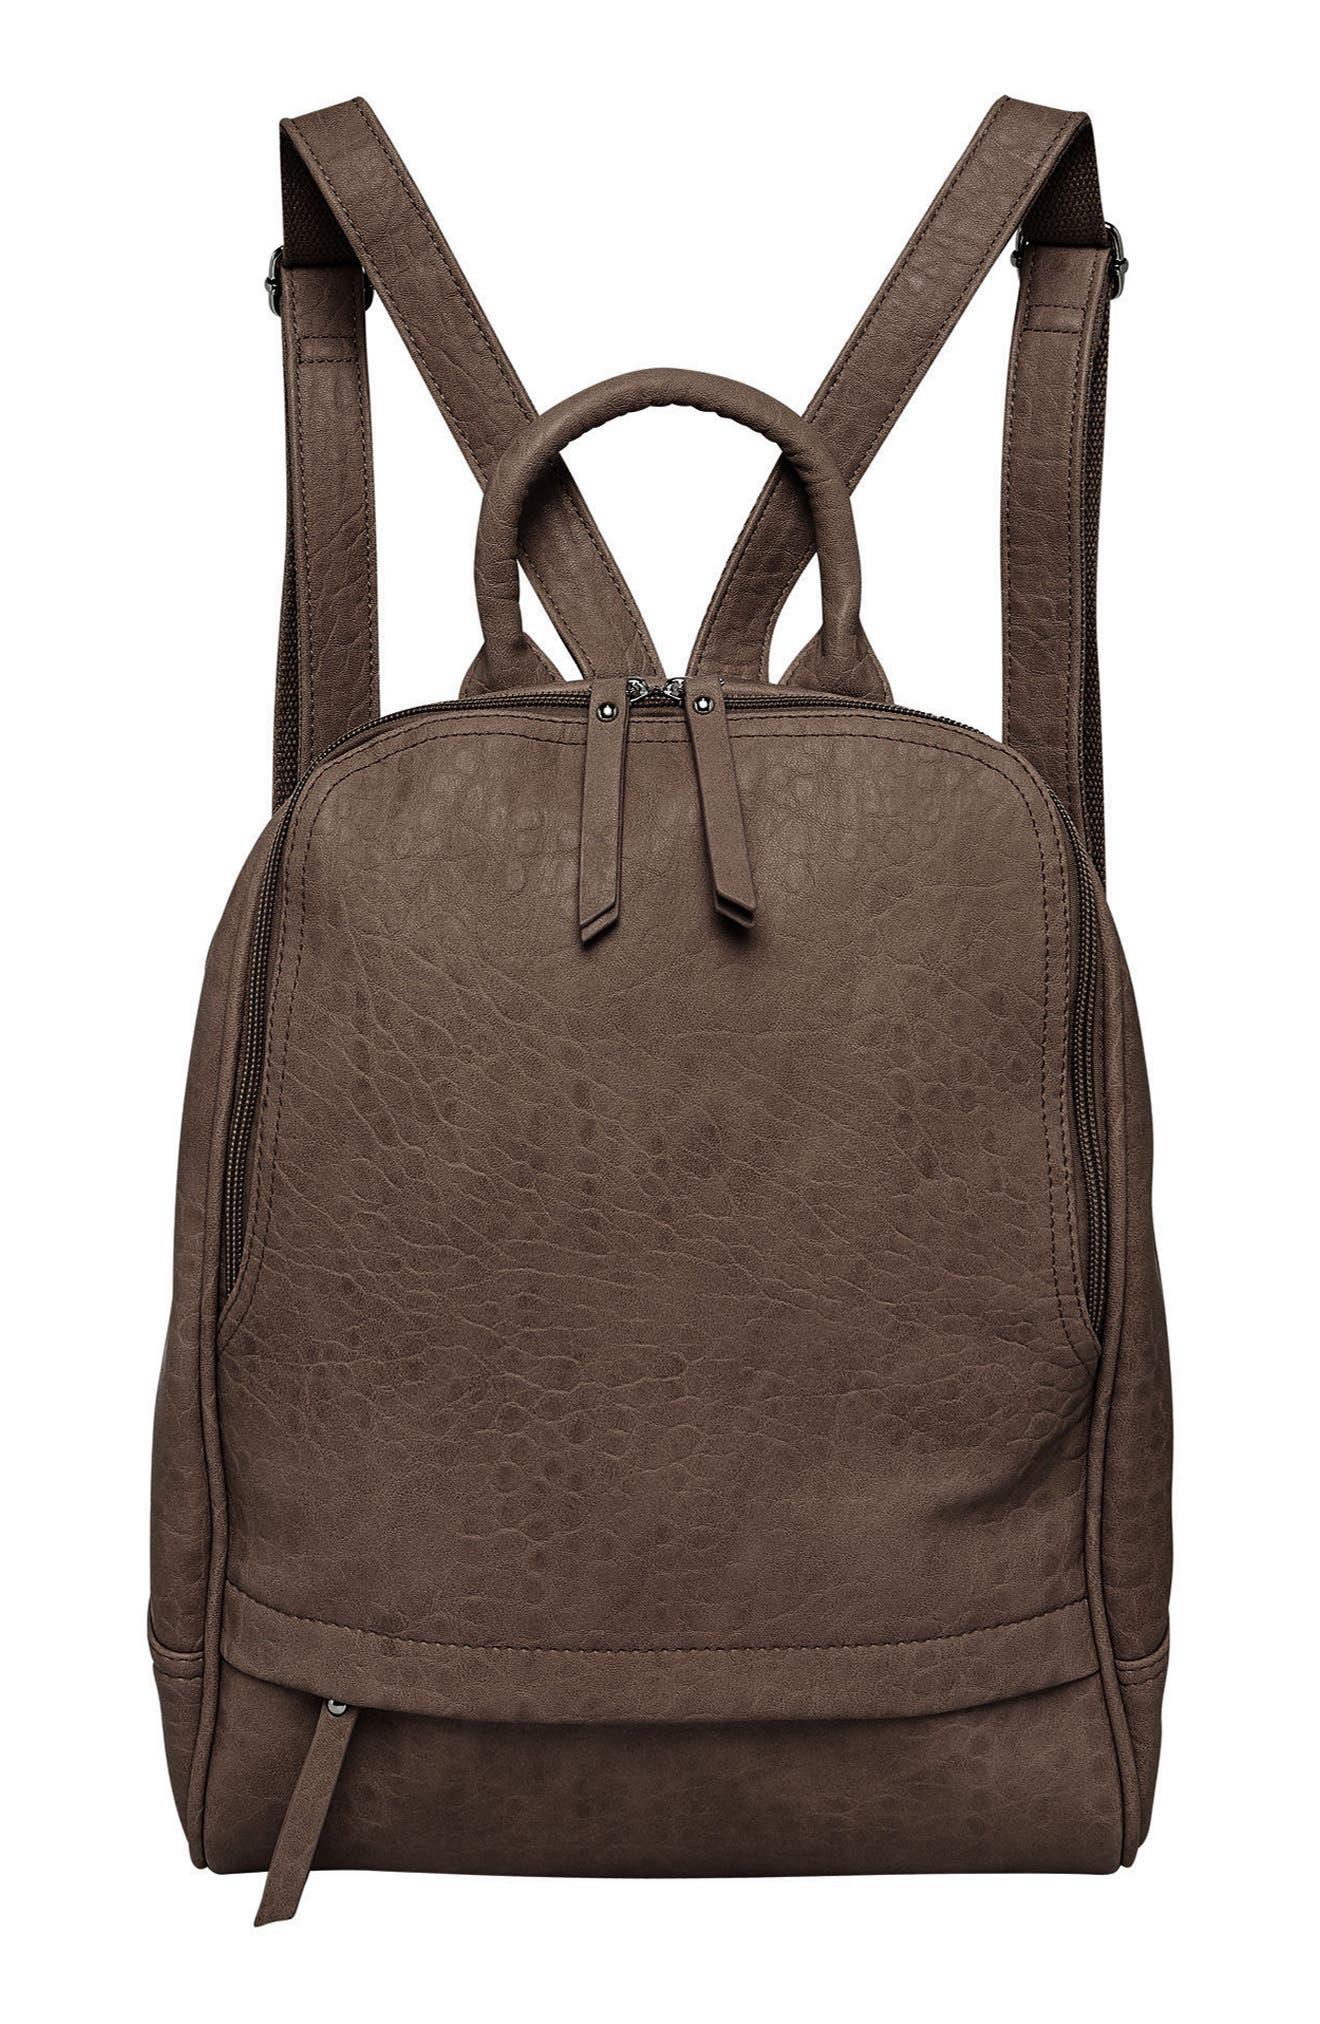 Main Image - Urban Originals My Way Vegan Leather Backpack